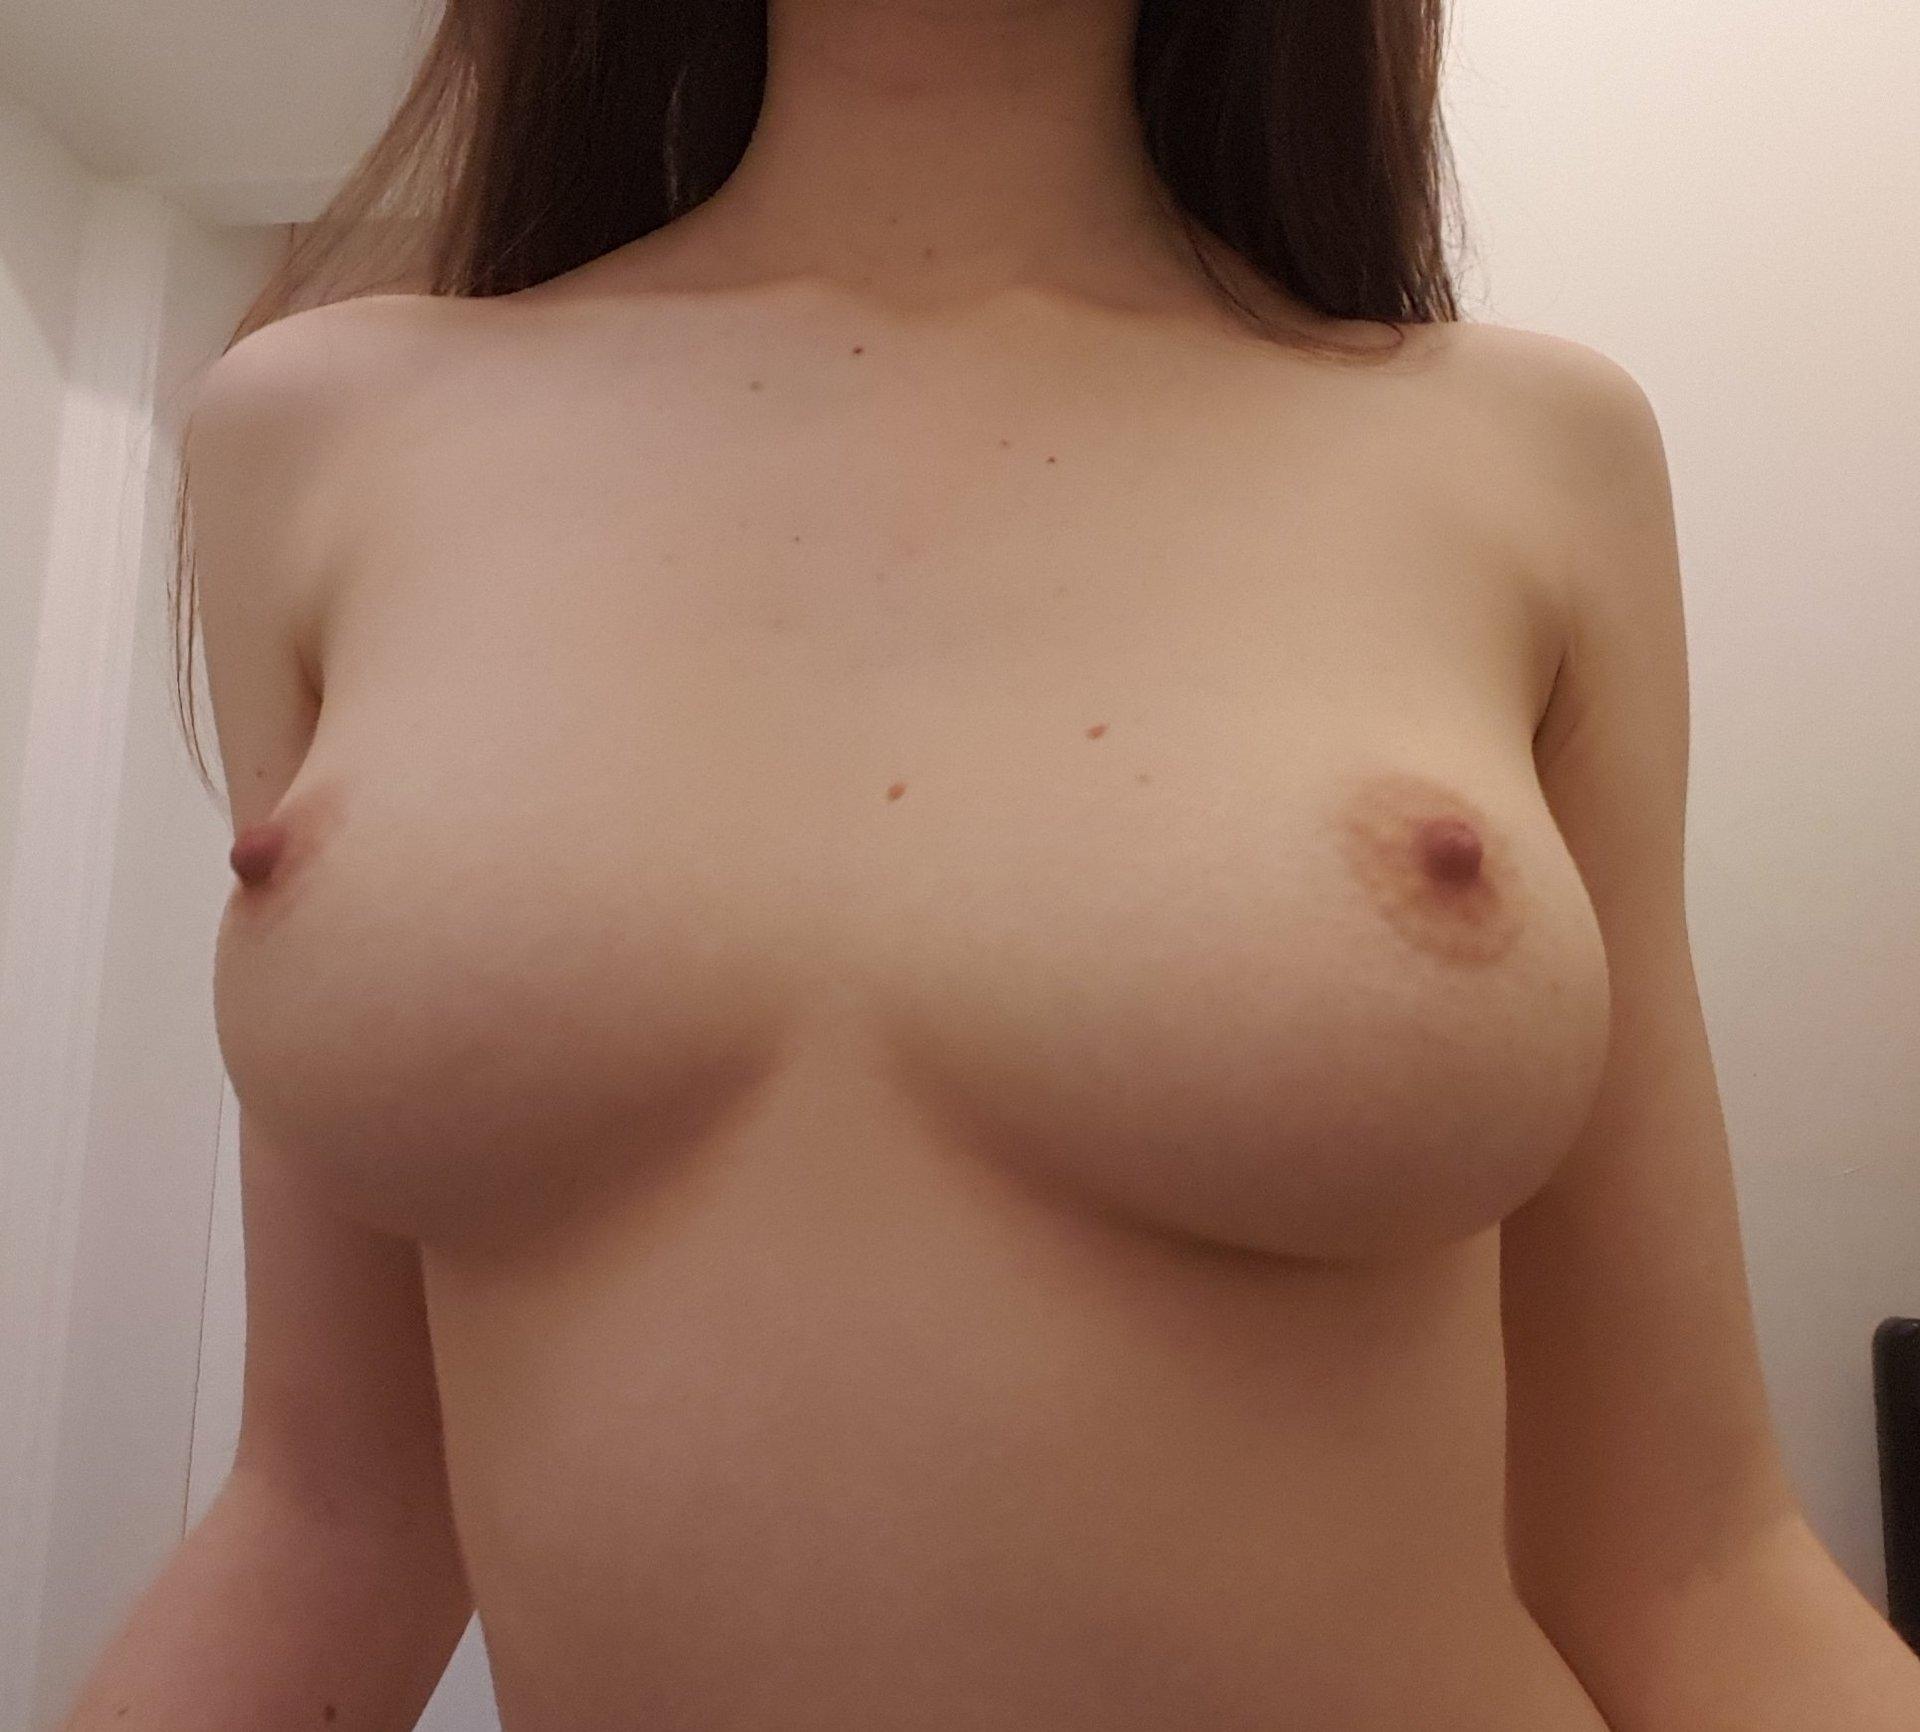 Allie Alliensfw Onlyfans Nude Leaks 0031